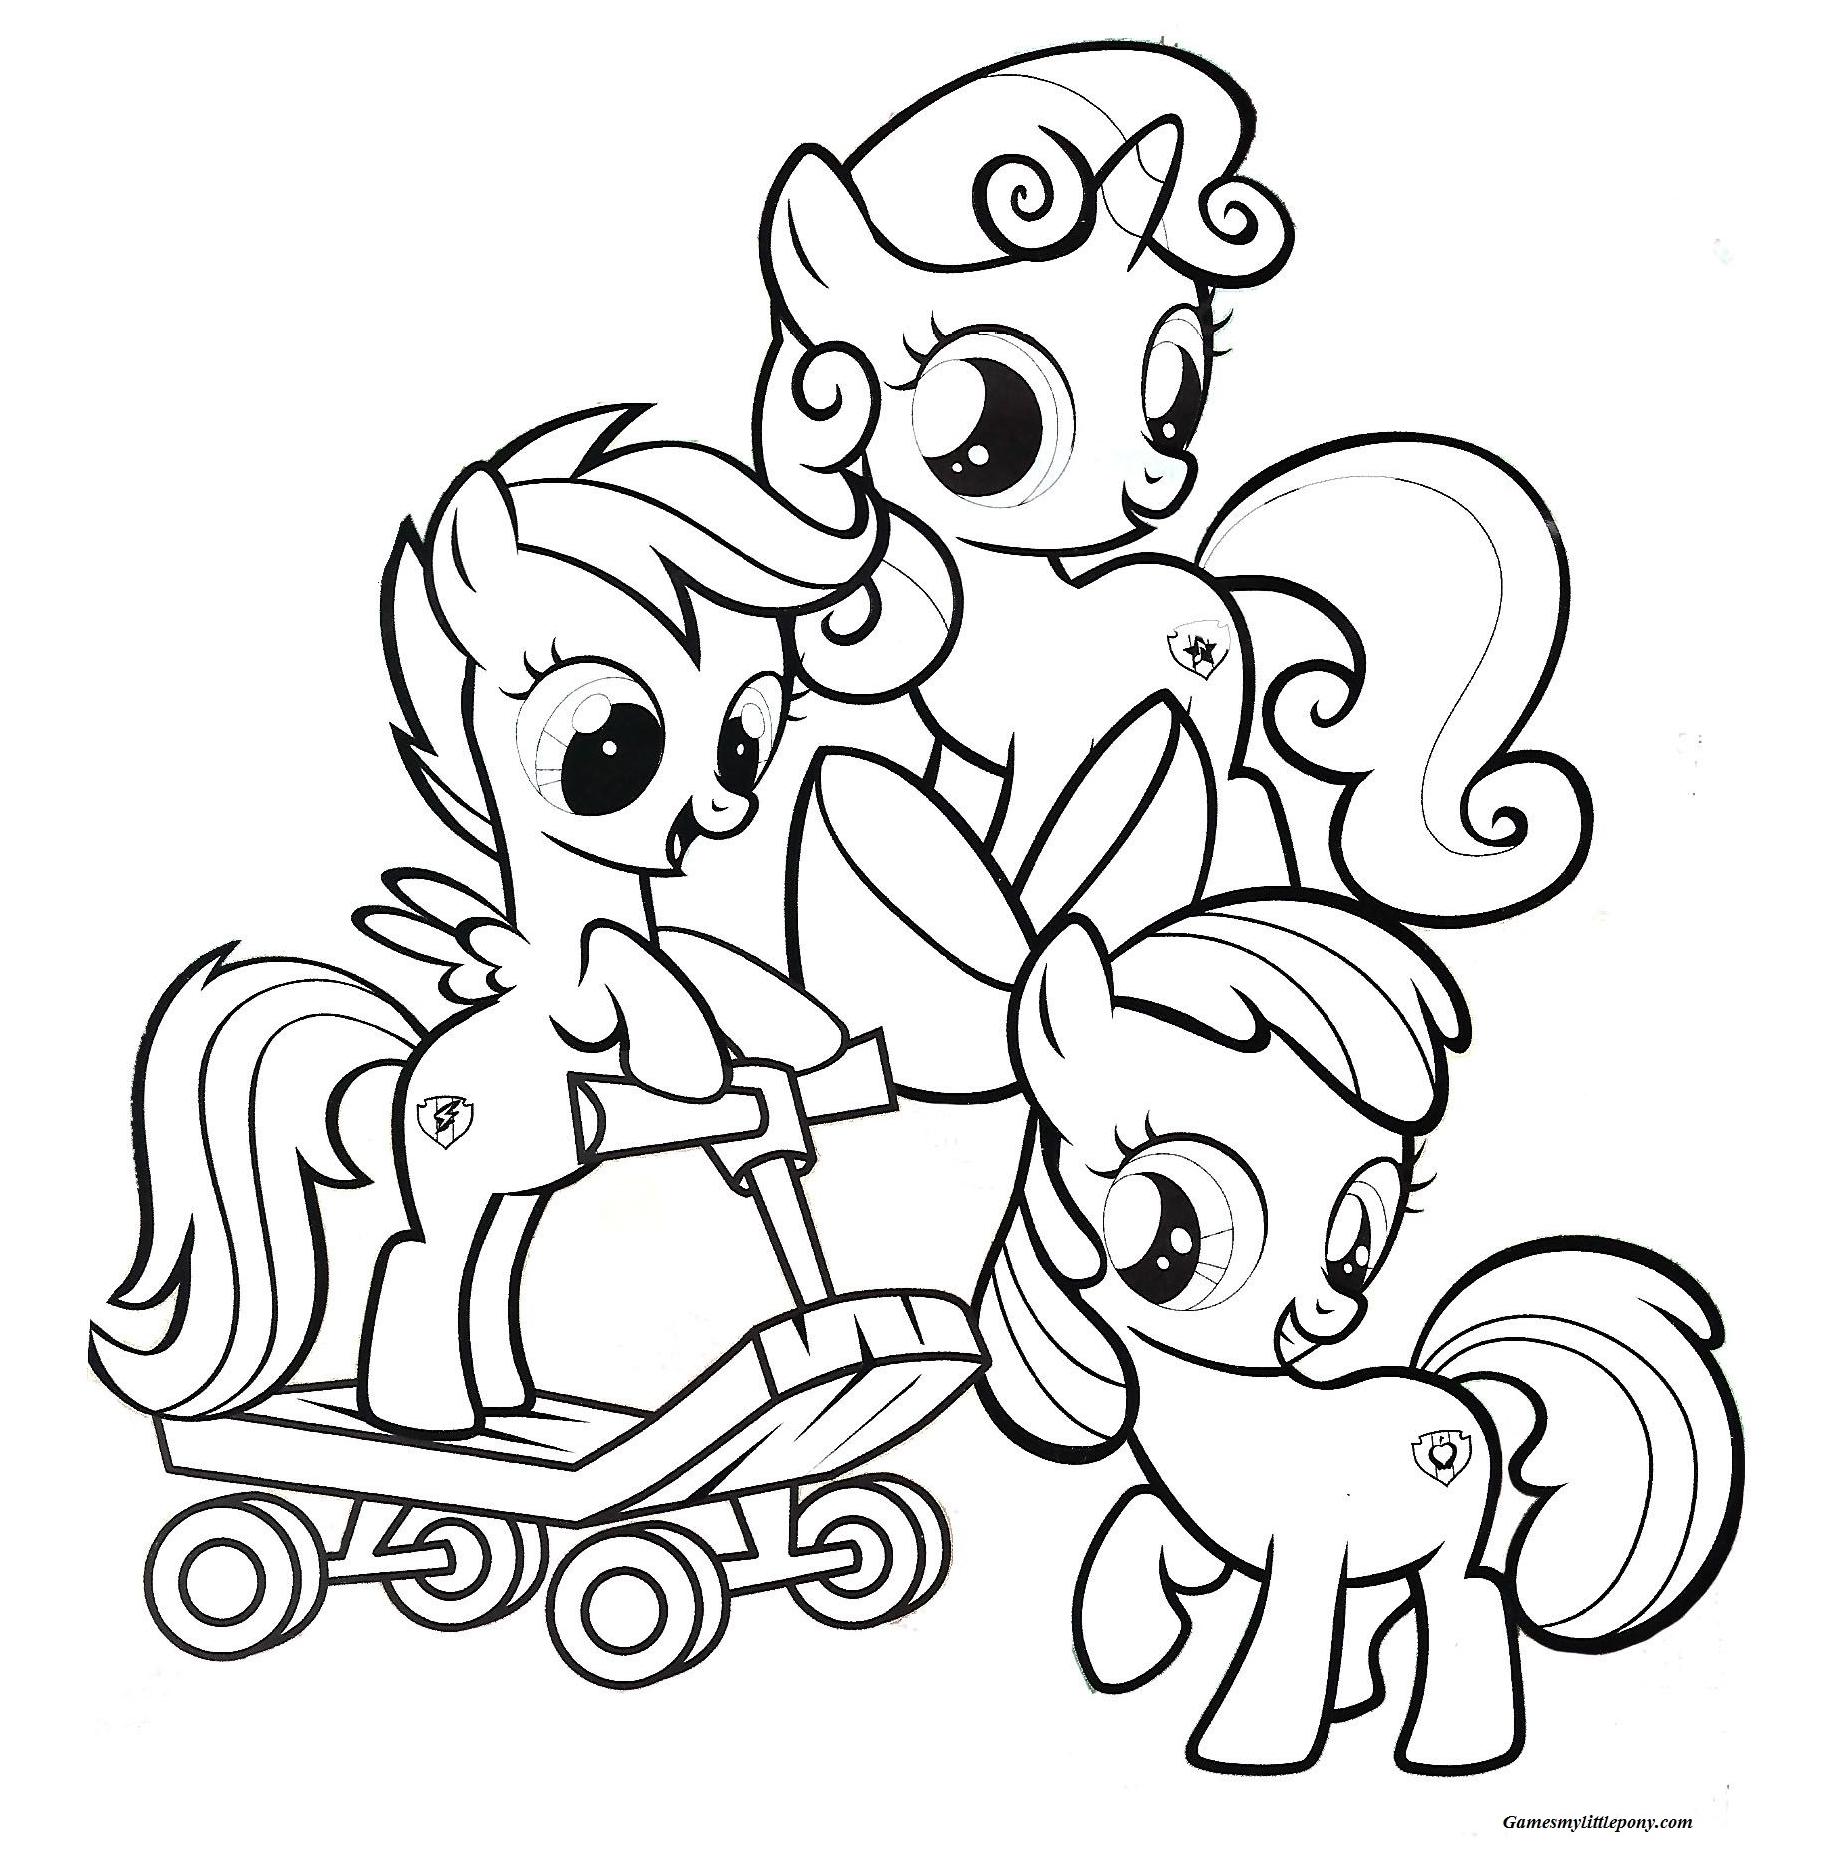 Funny Rainbow Dash Pinkie Pie and Twilight Sparkle